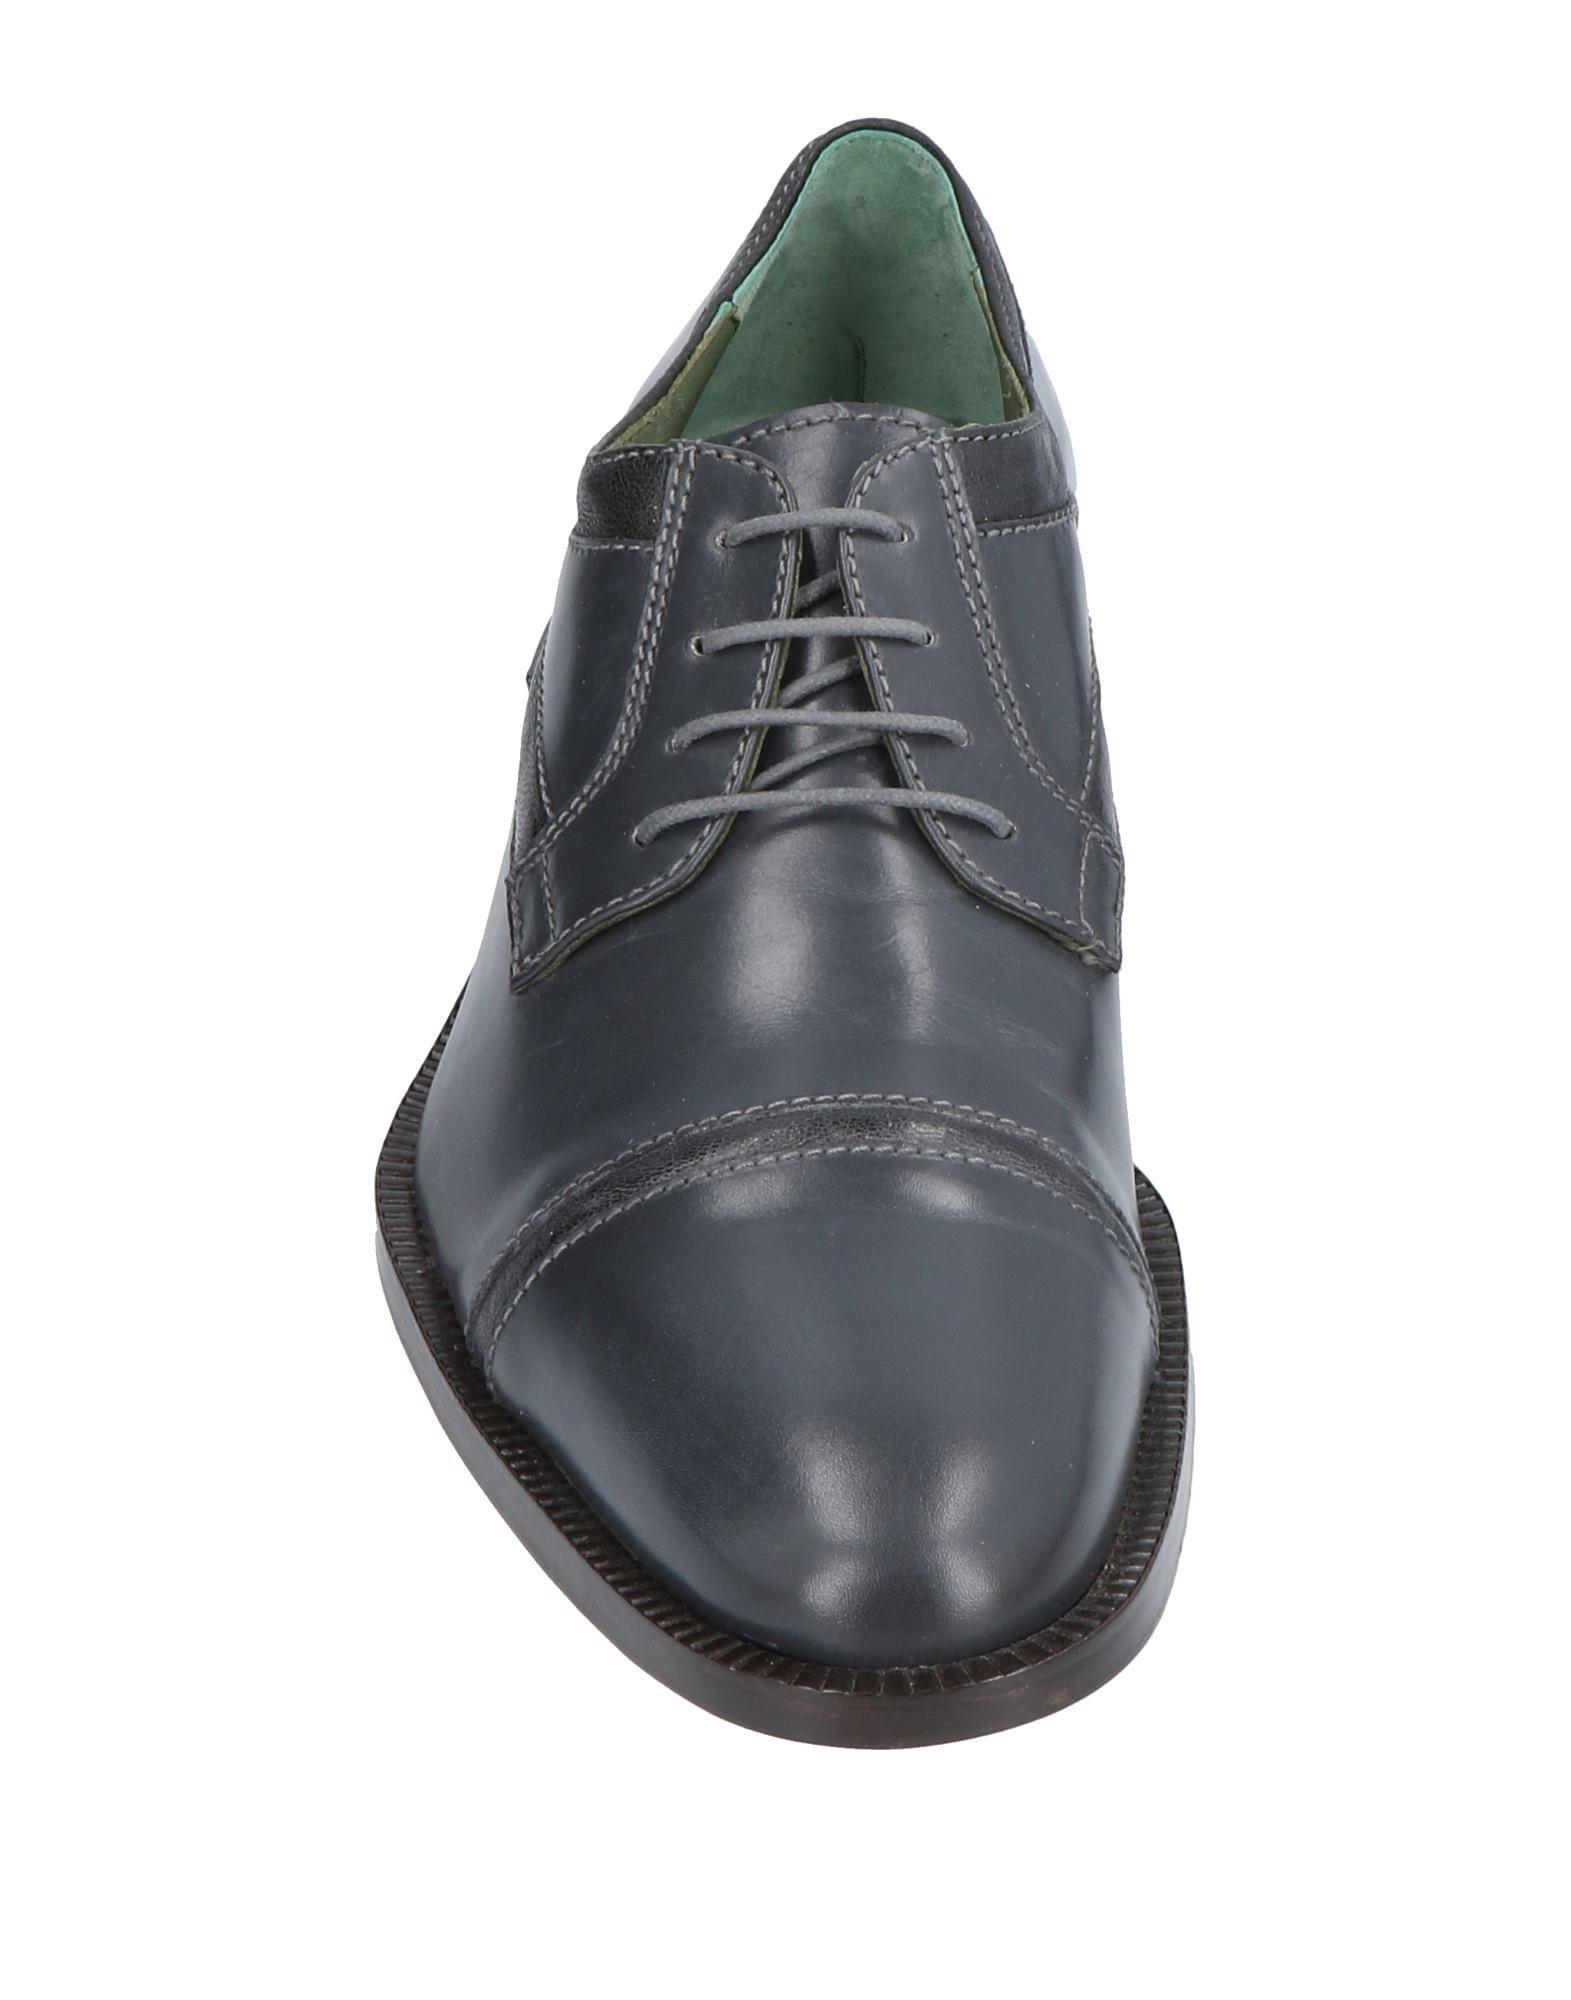 Vivienne Westwood Herren Schnürschuhe Herren Westwood  11489004UO Neue Schuhe 0e7d71